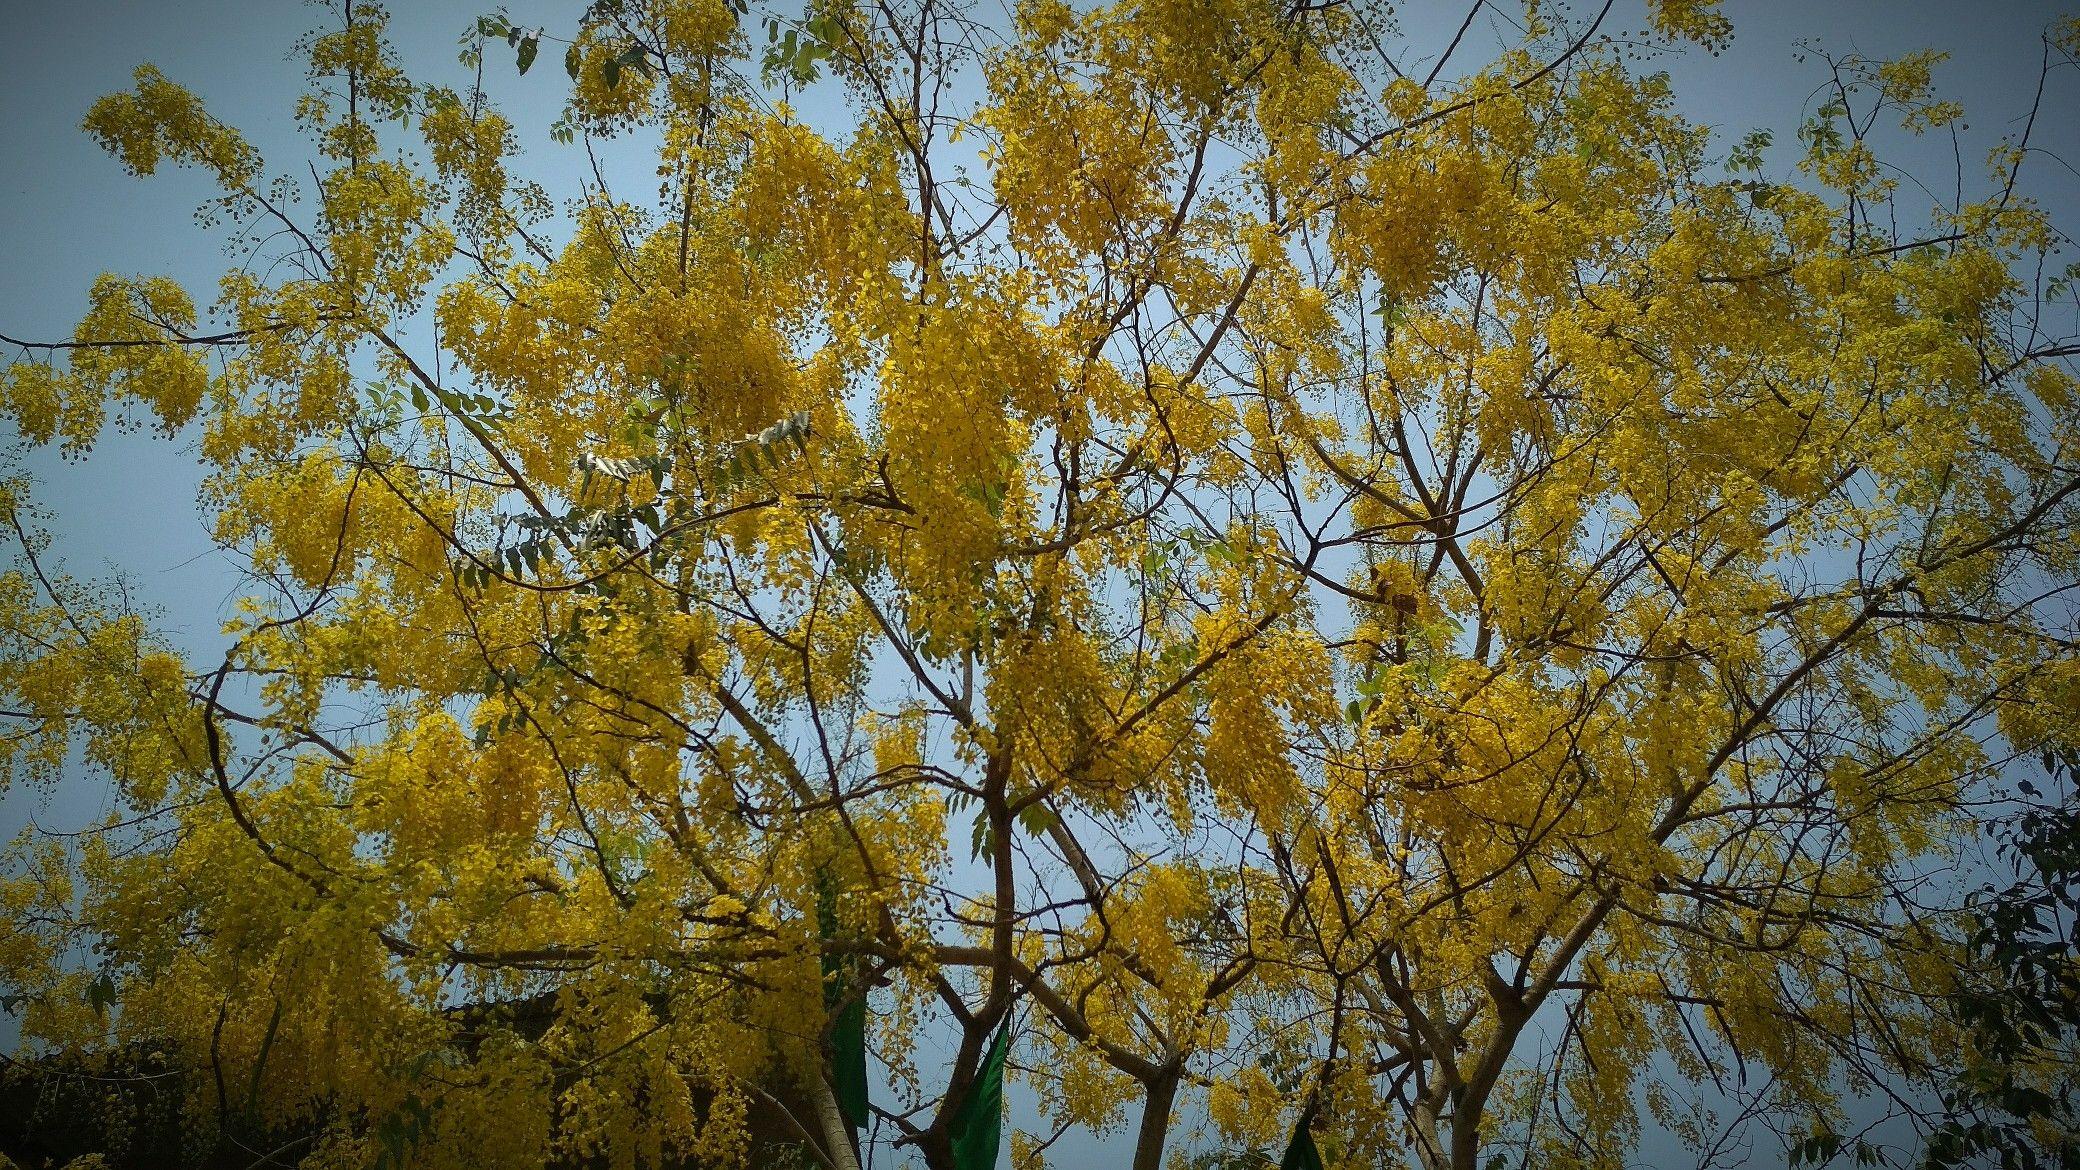 Kanikkonna vishukani Cassia fistula, known as the golden